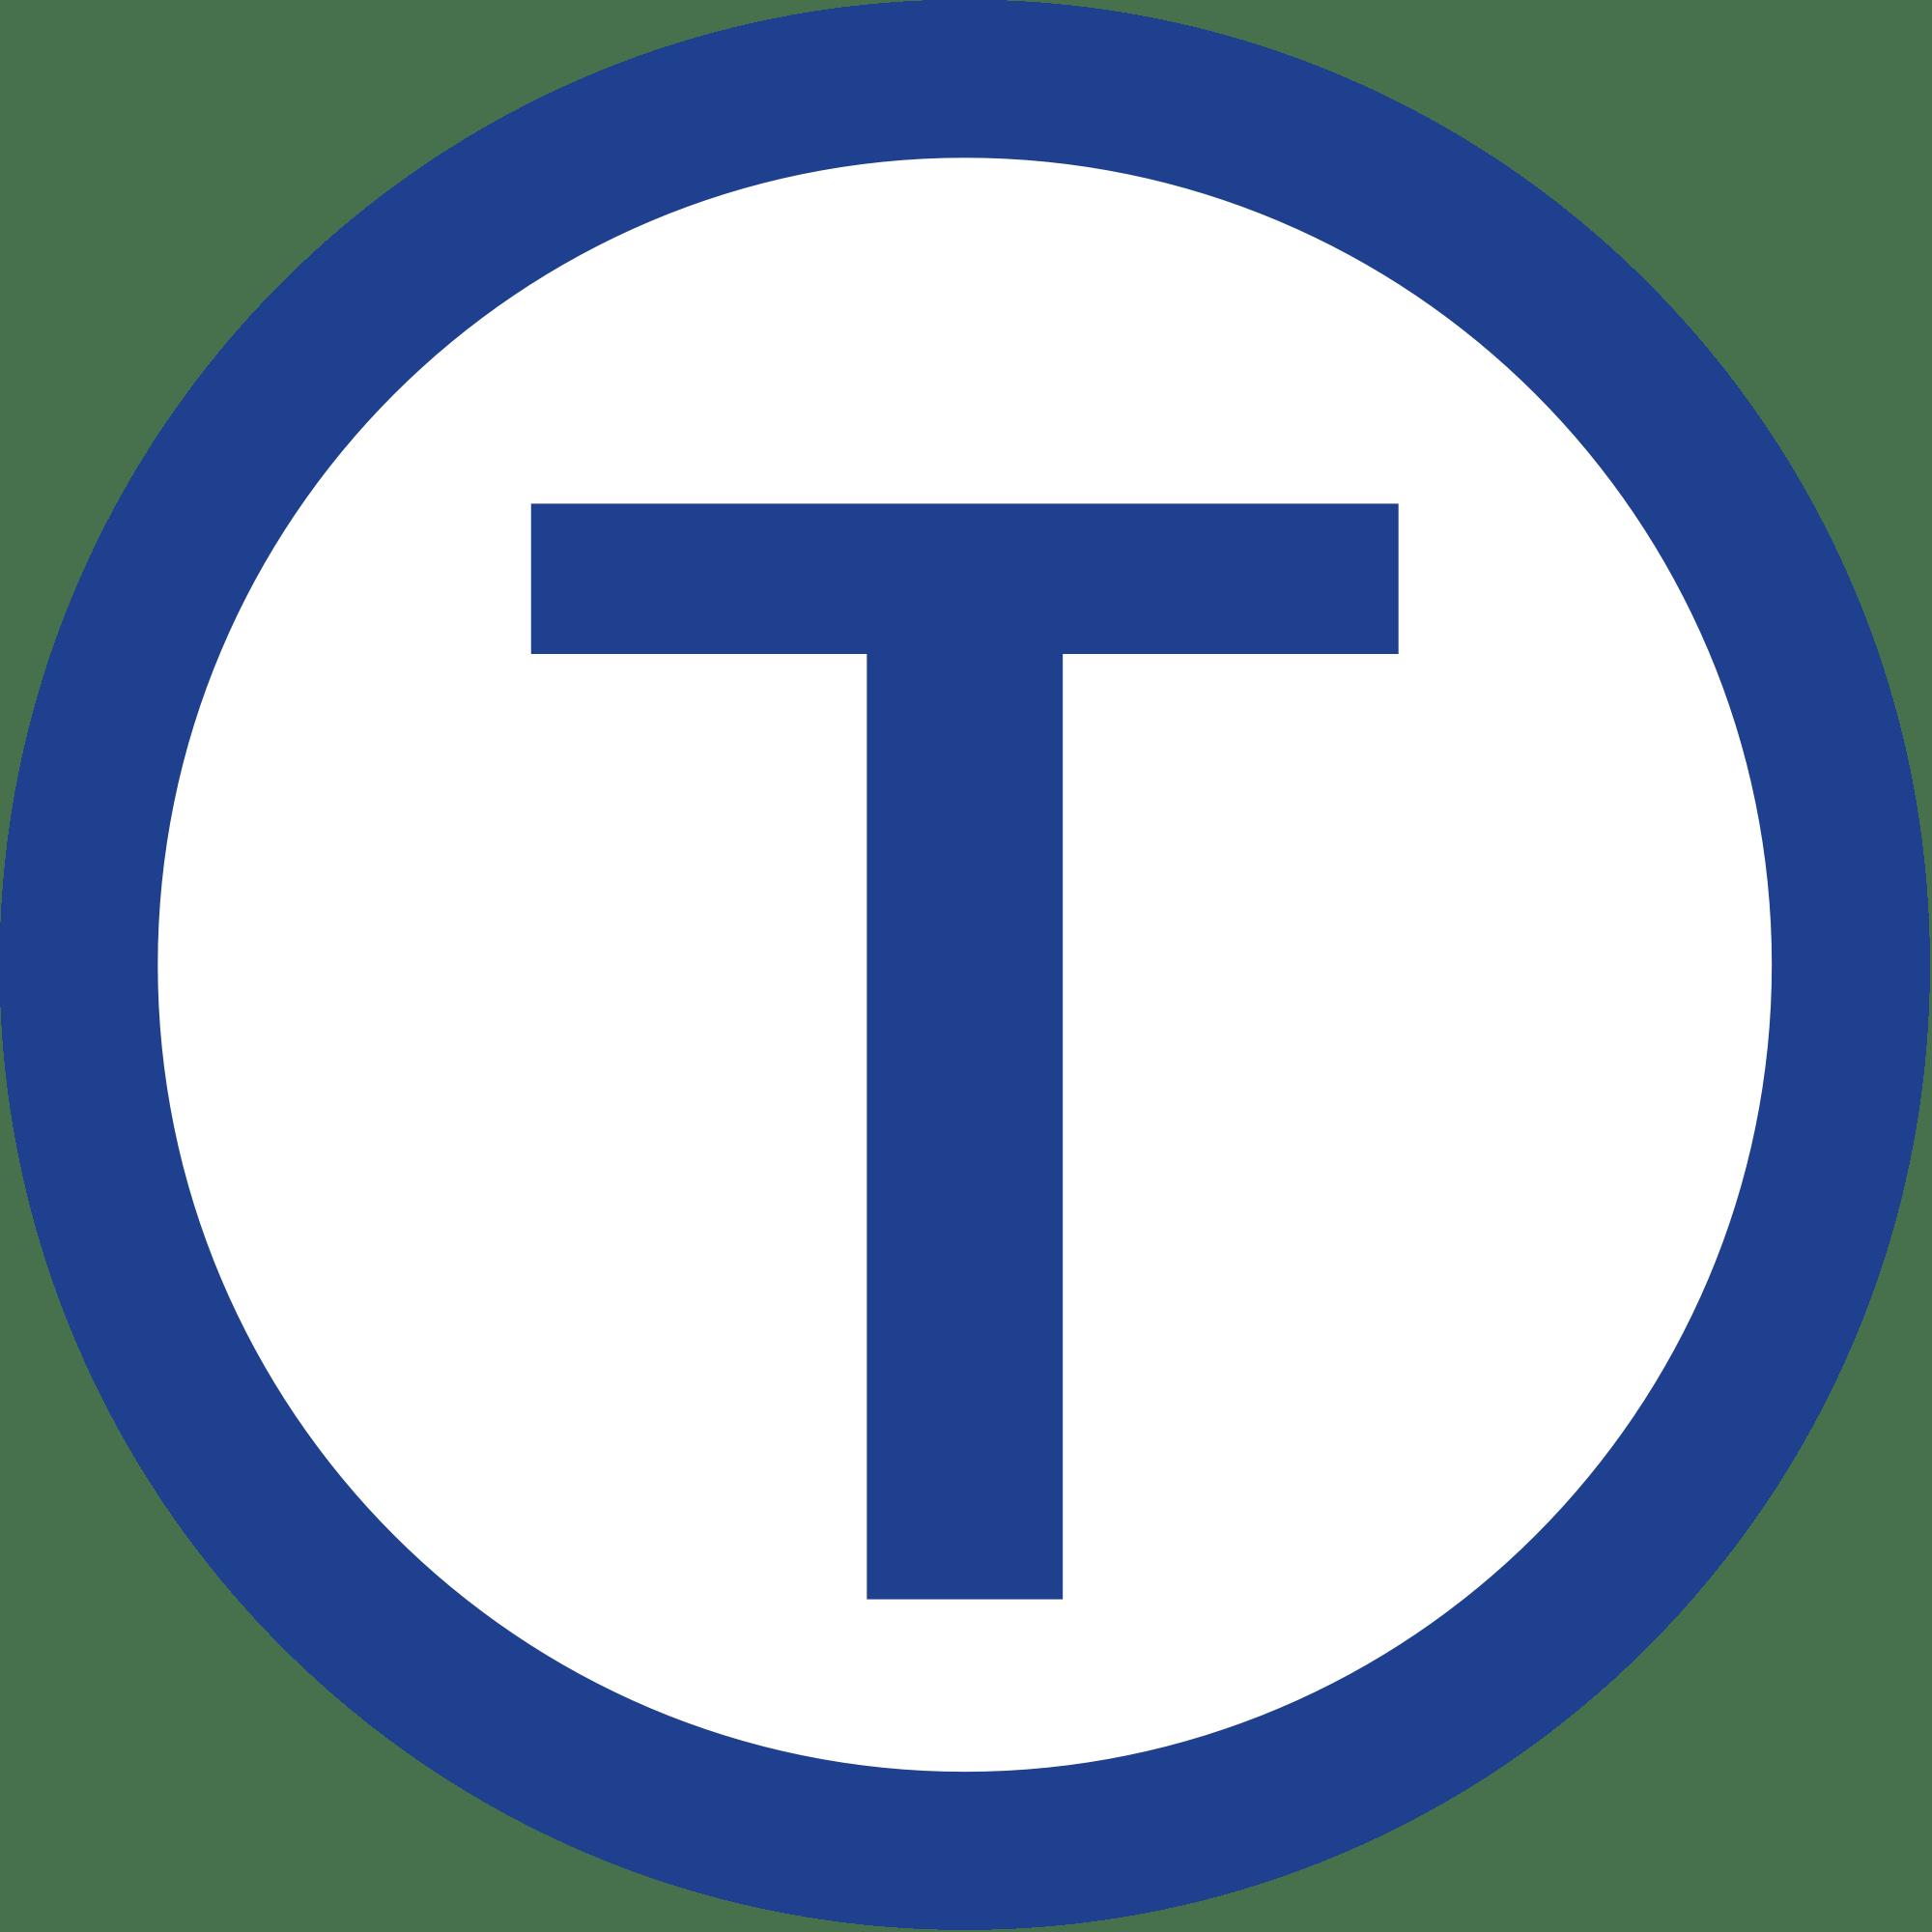 Letter t11